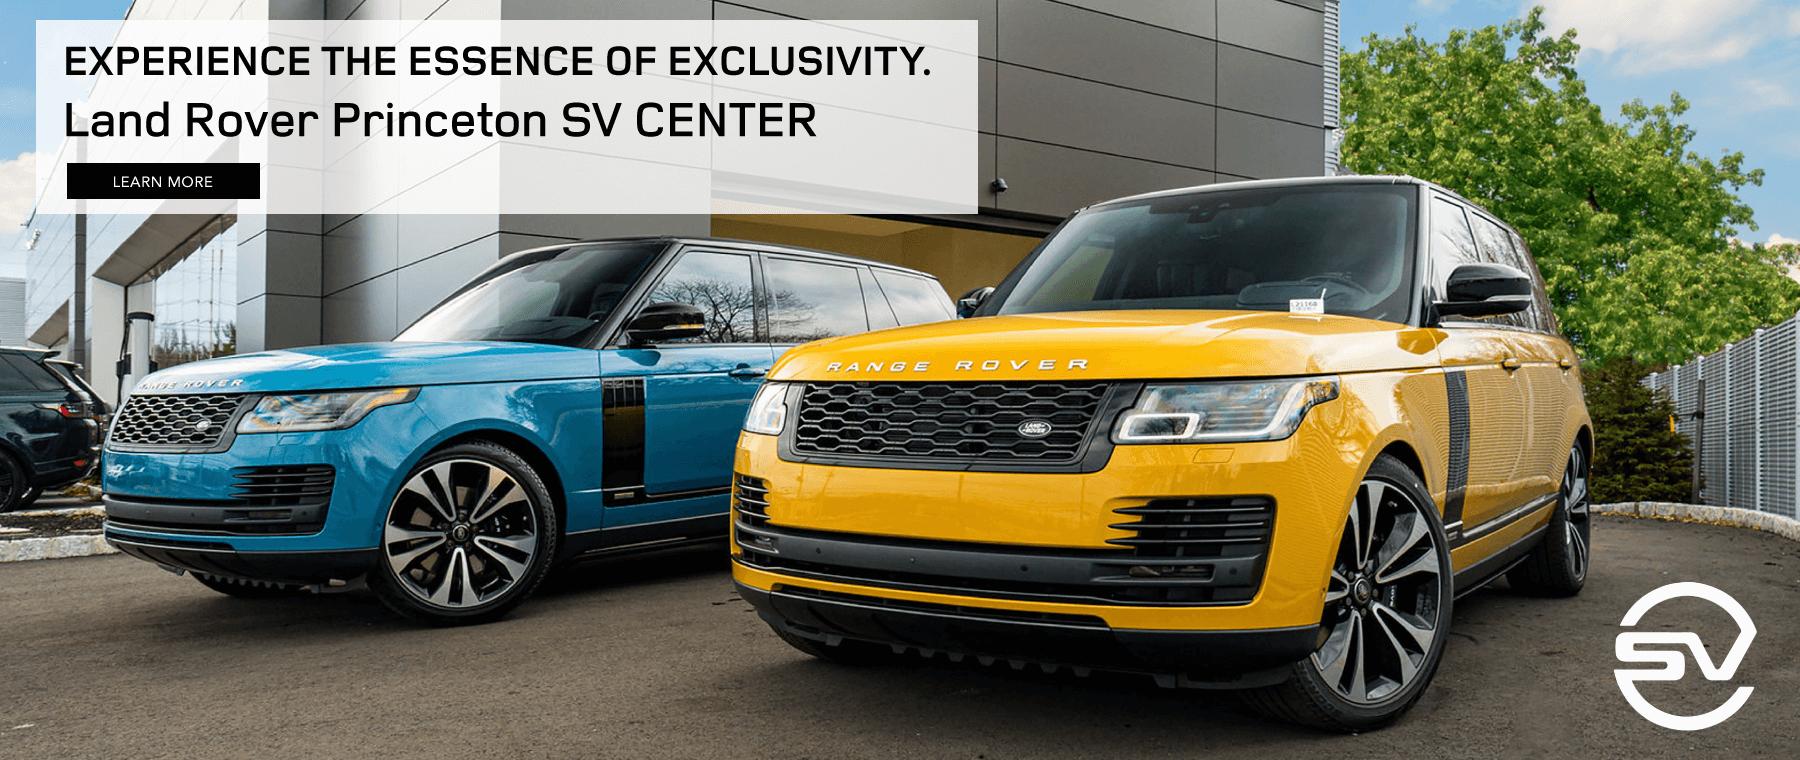 Land-Rover-Princeton-SV-Center Optimized